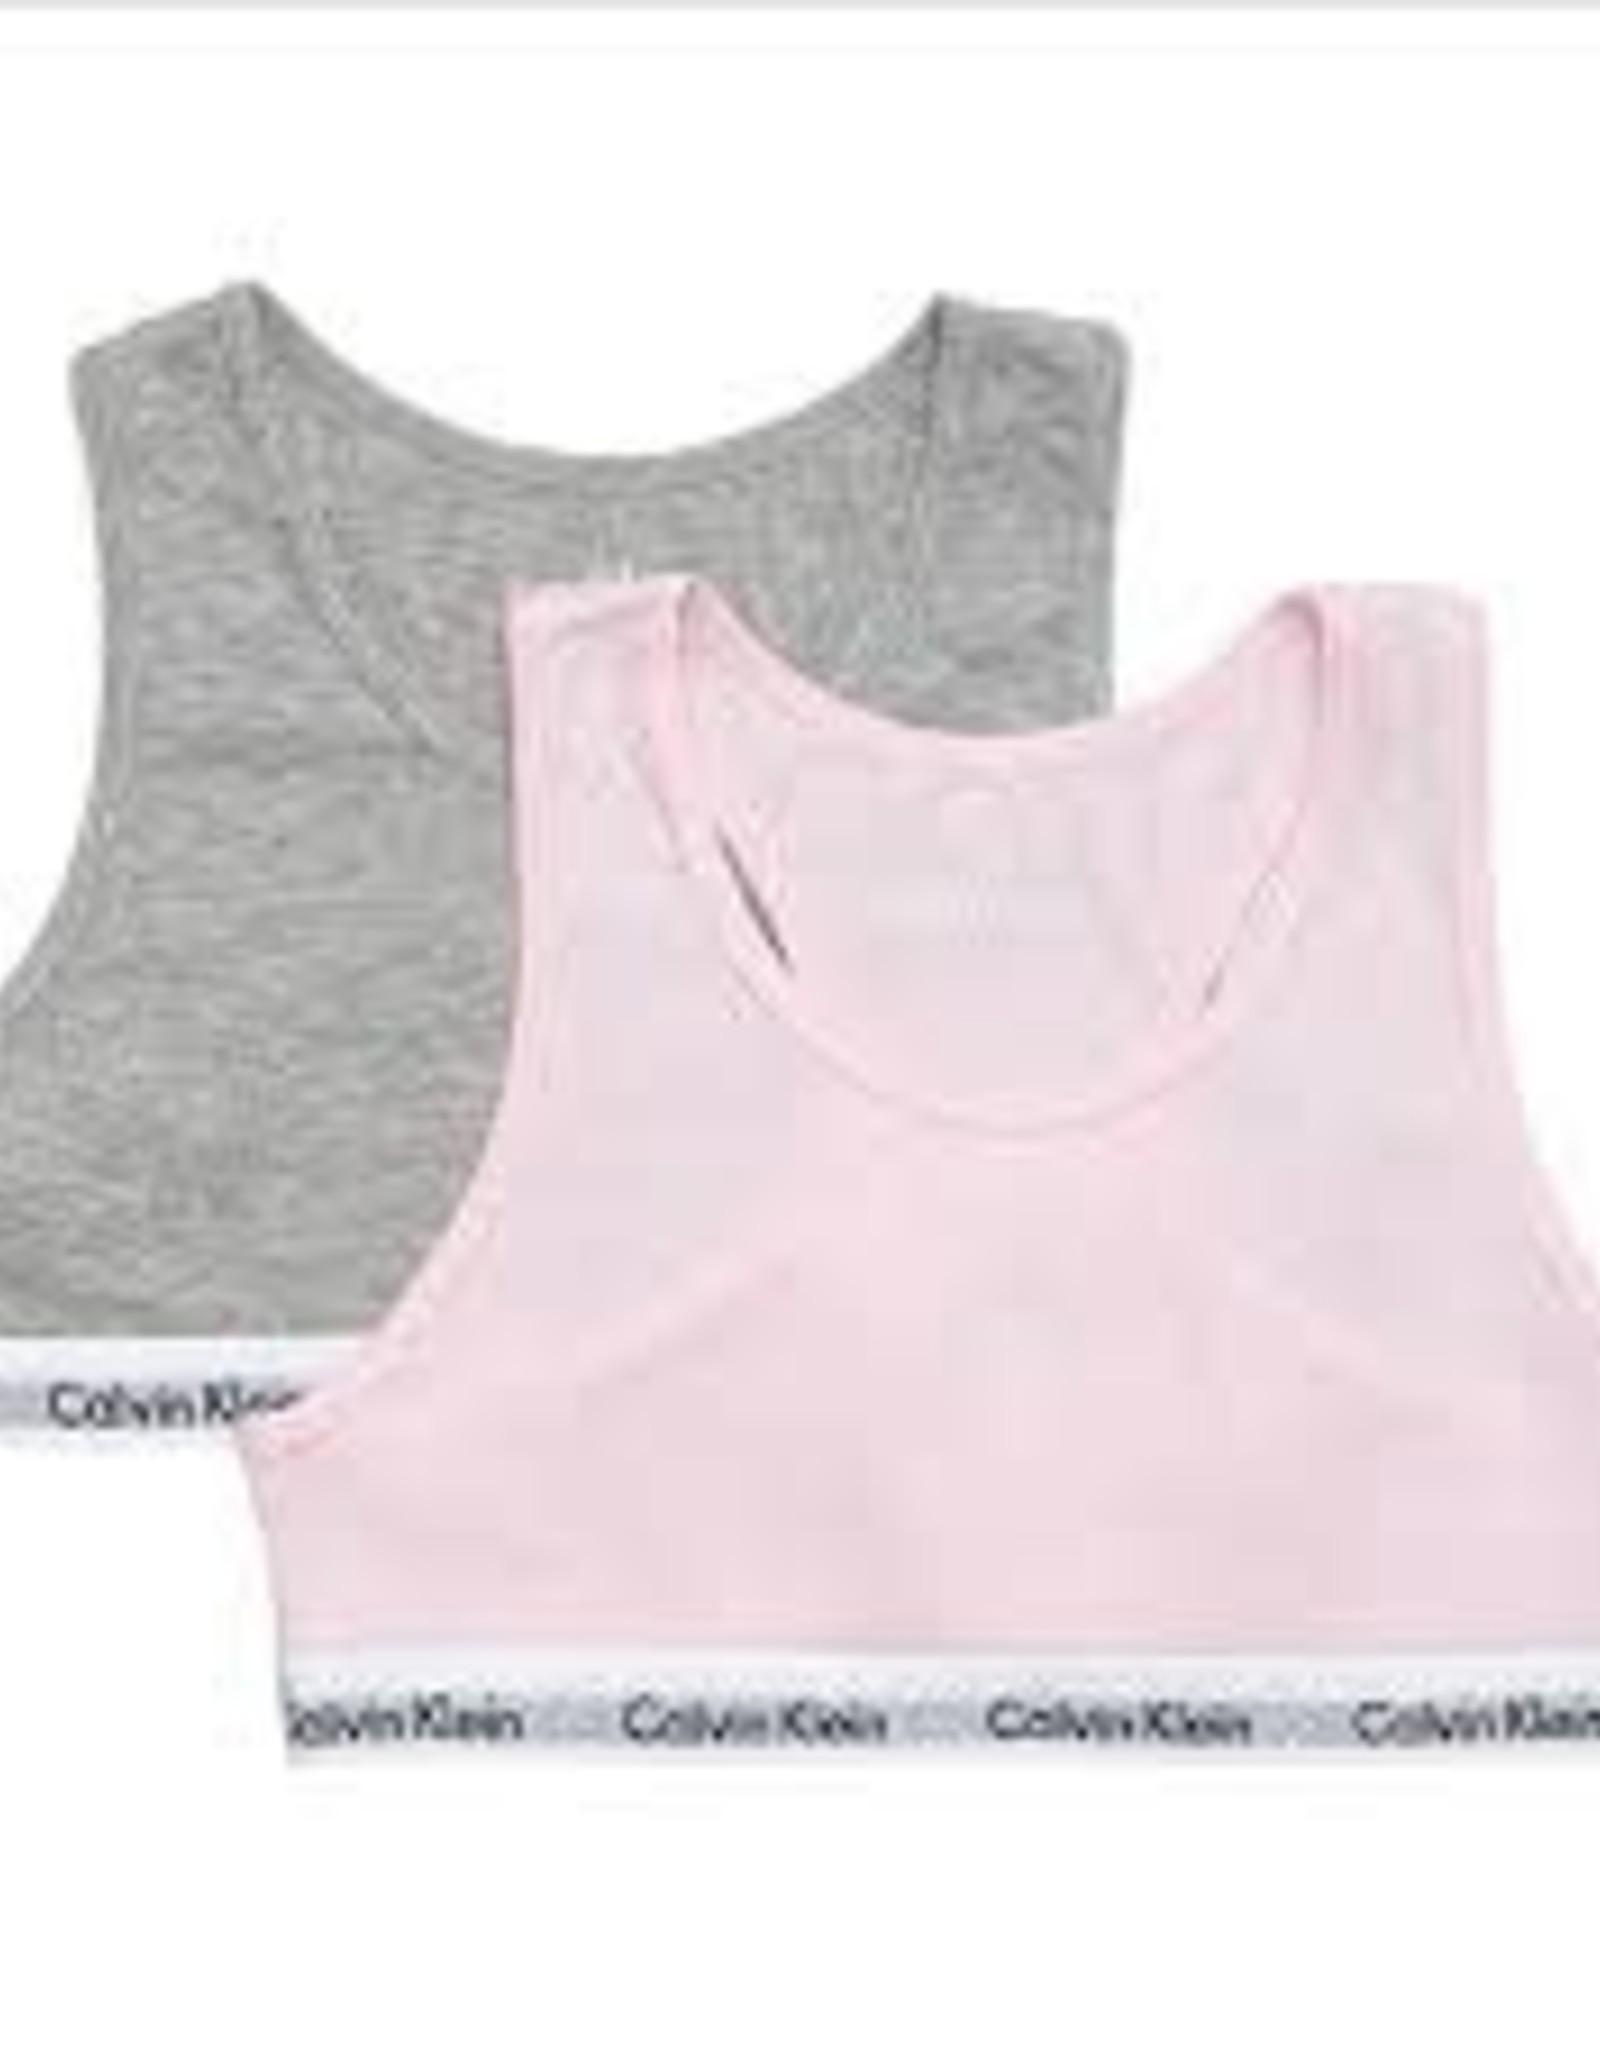 Calvin Klein 2PK Bralette Pink/Grey